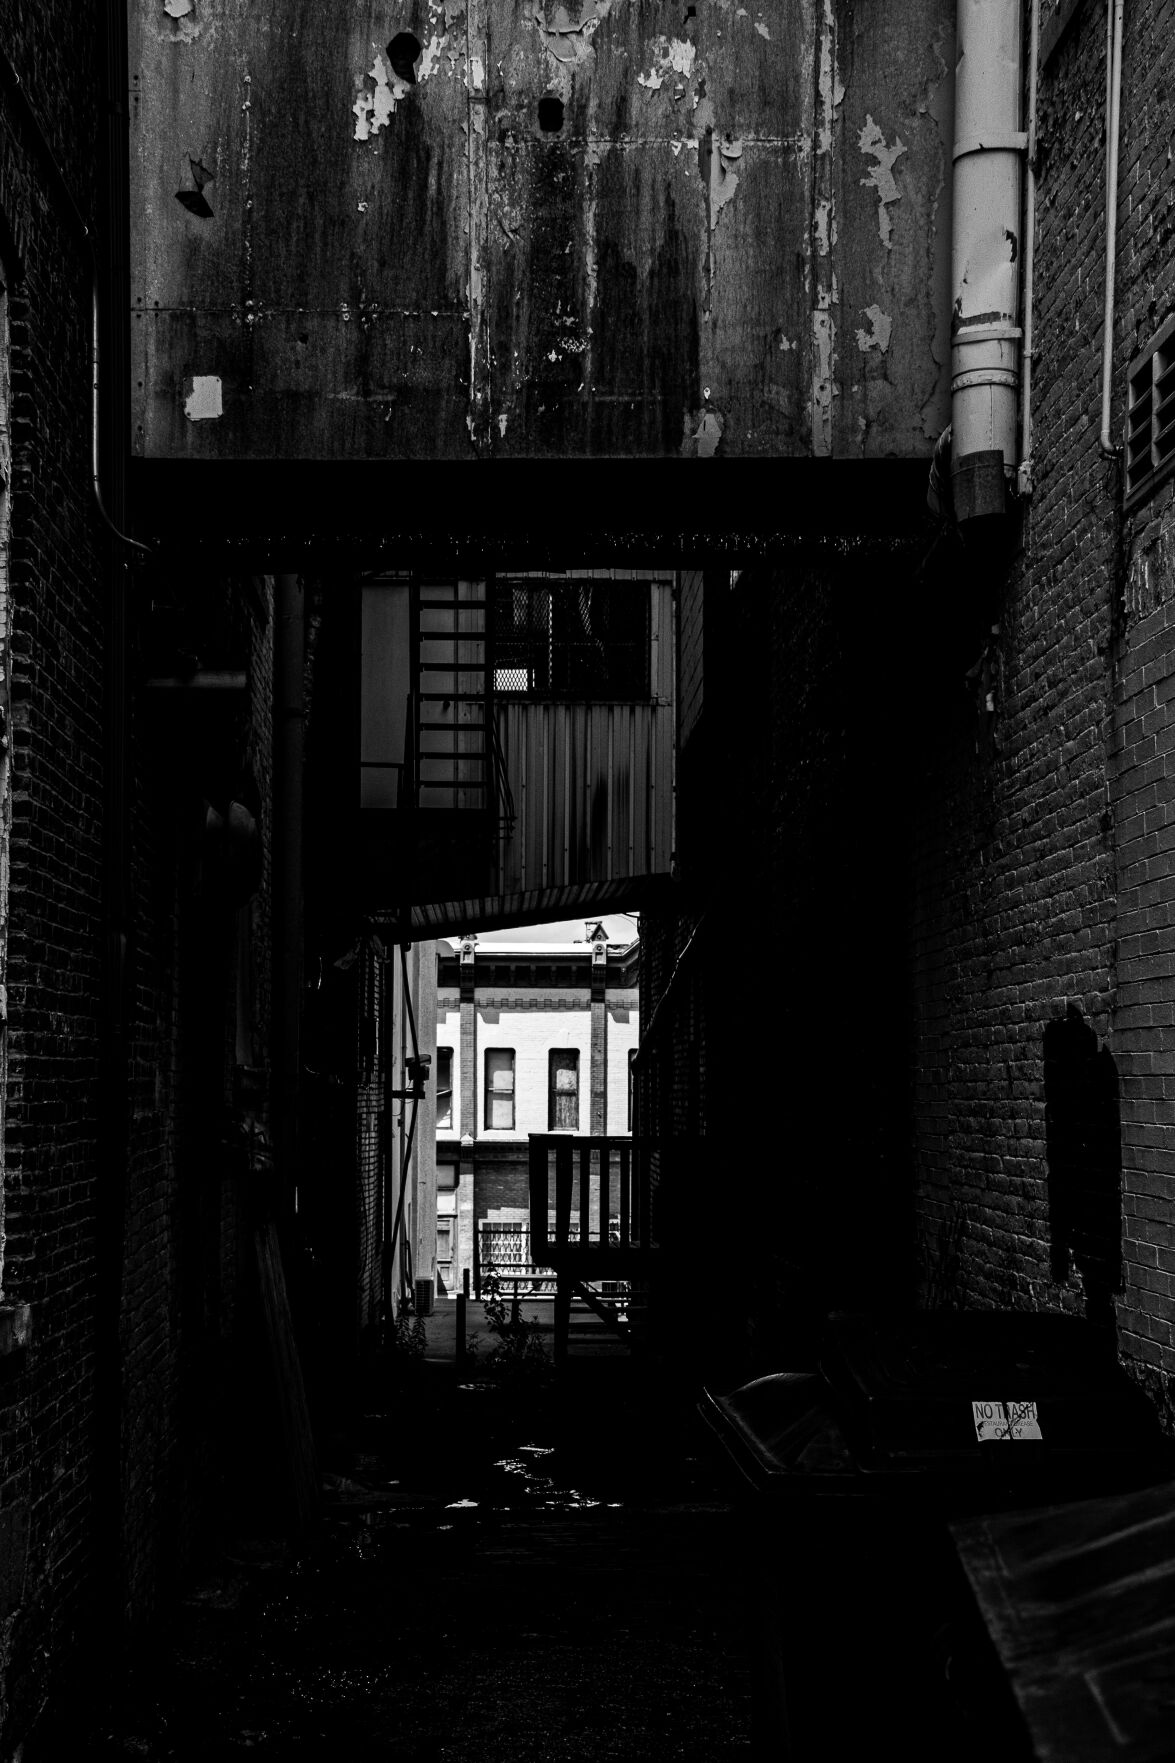 Passageway by Braxton Daniels